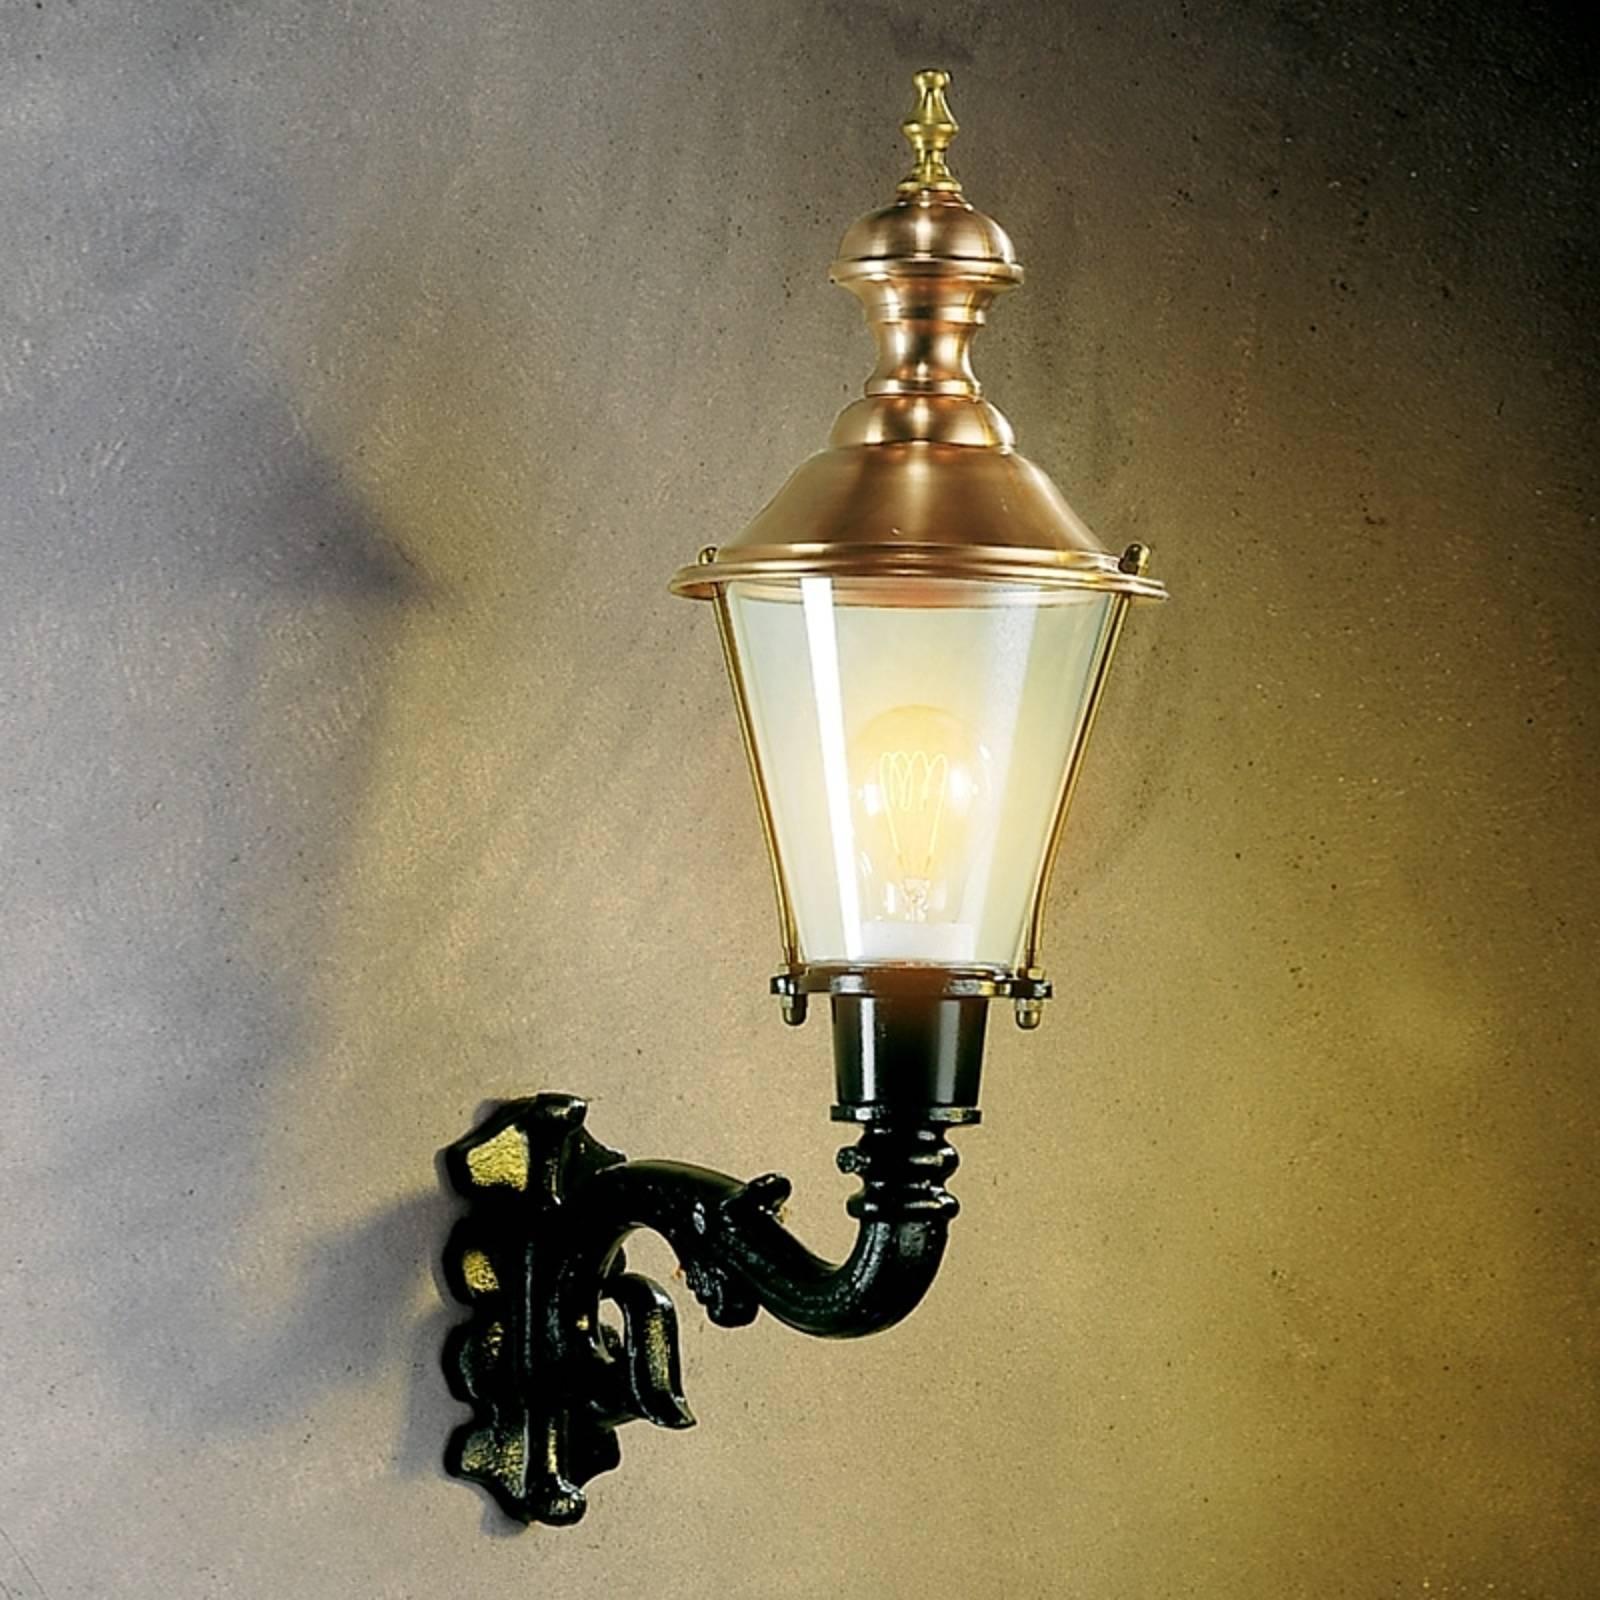 Buitenwandlamp Hoorn, fitting boven, groen